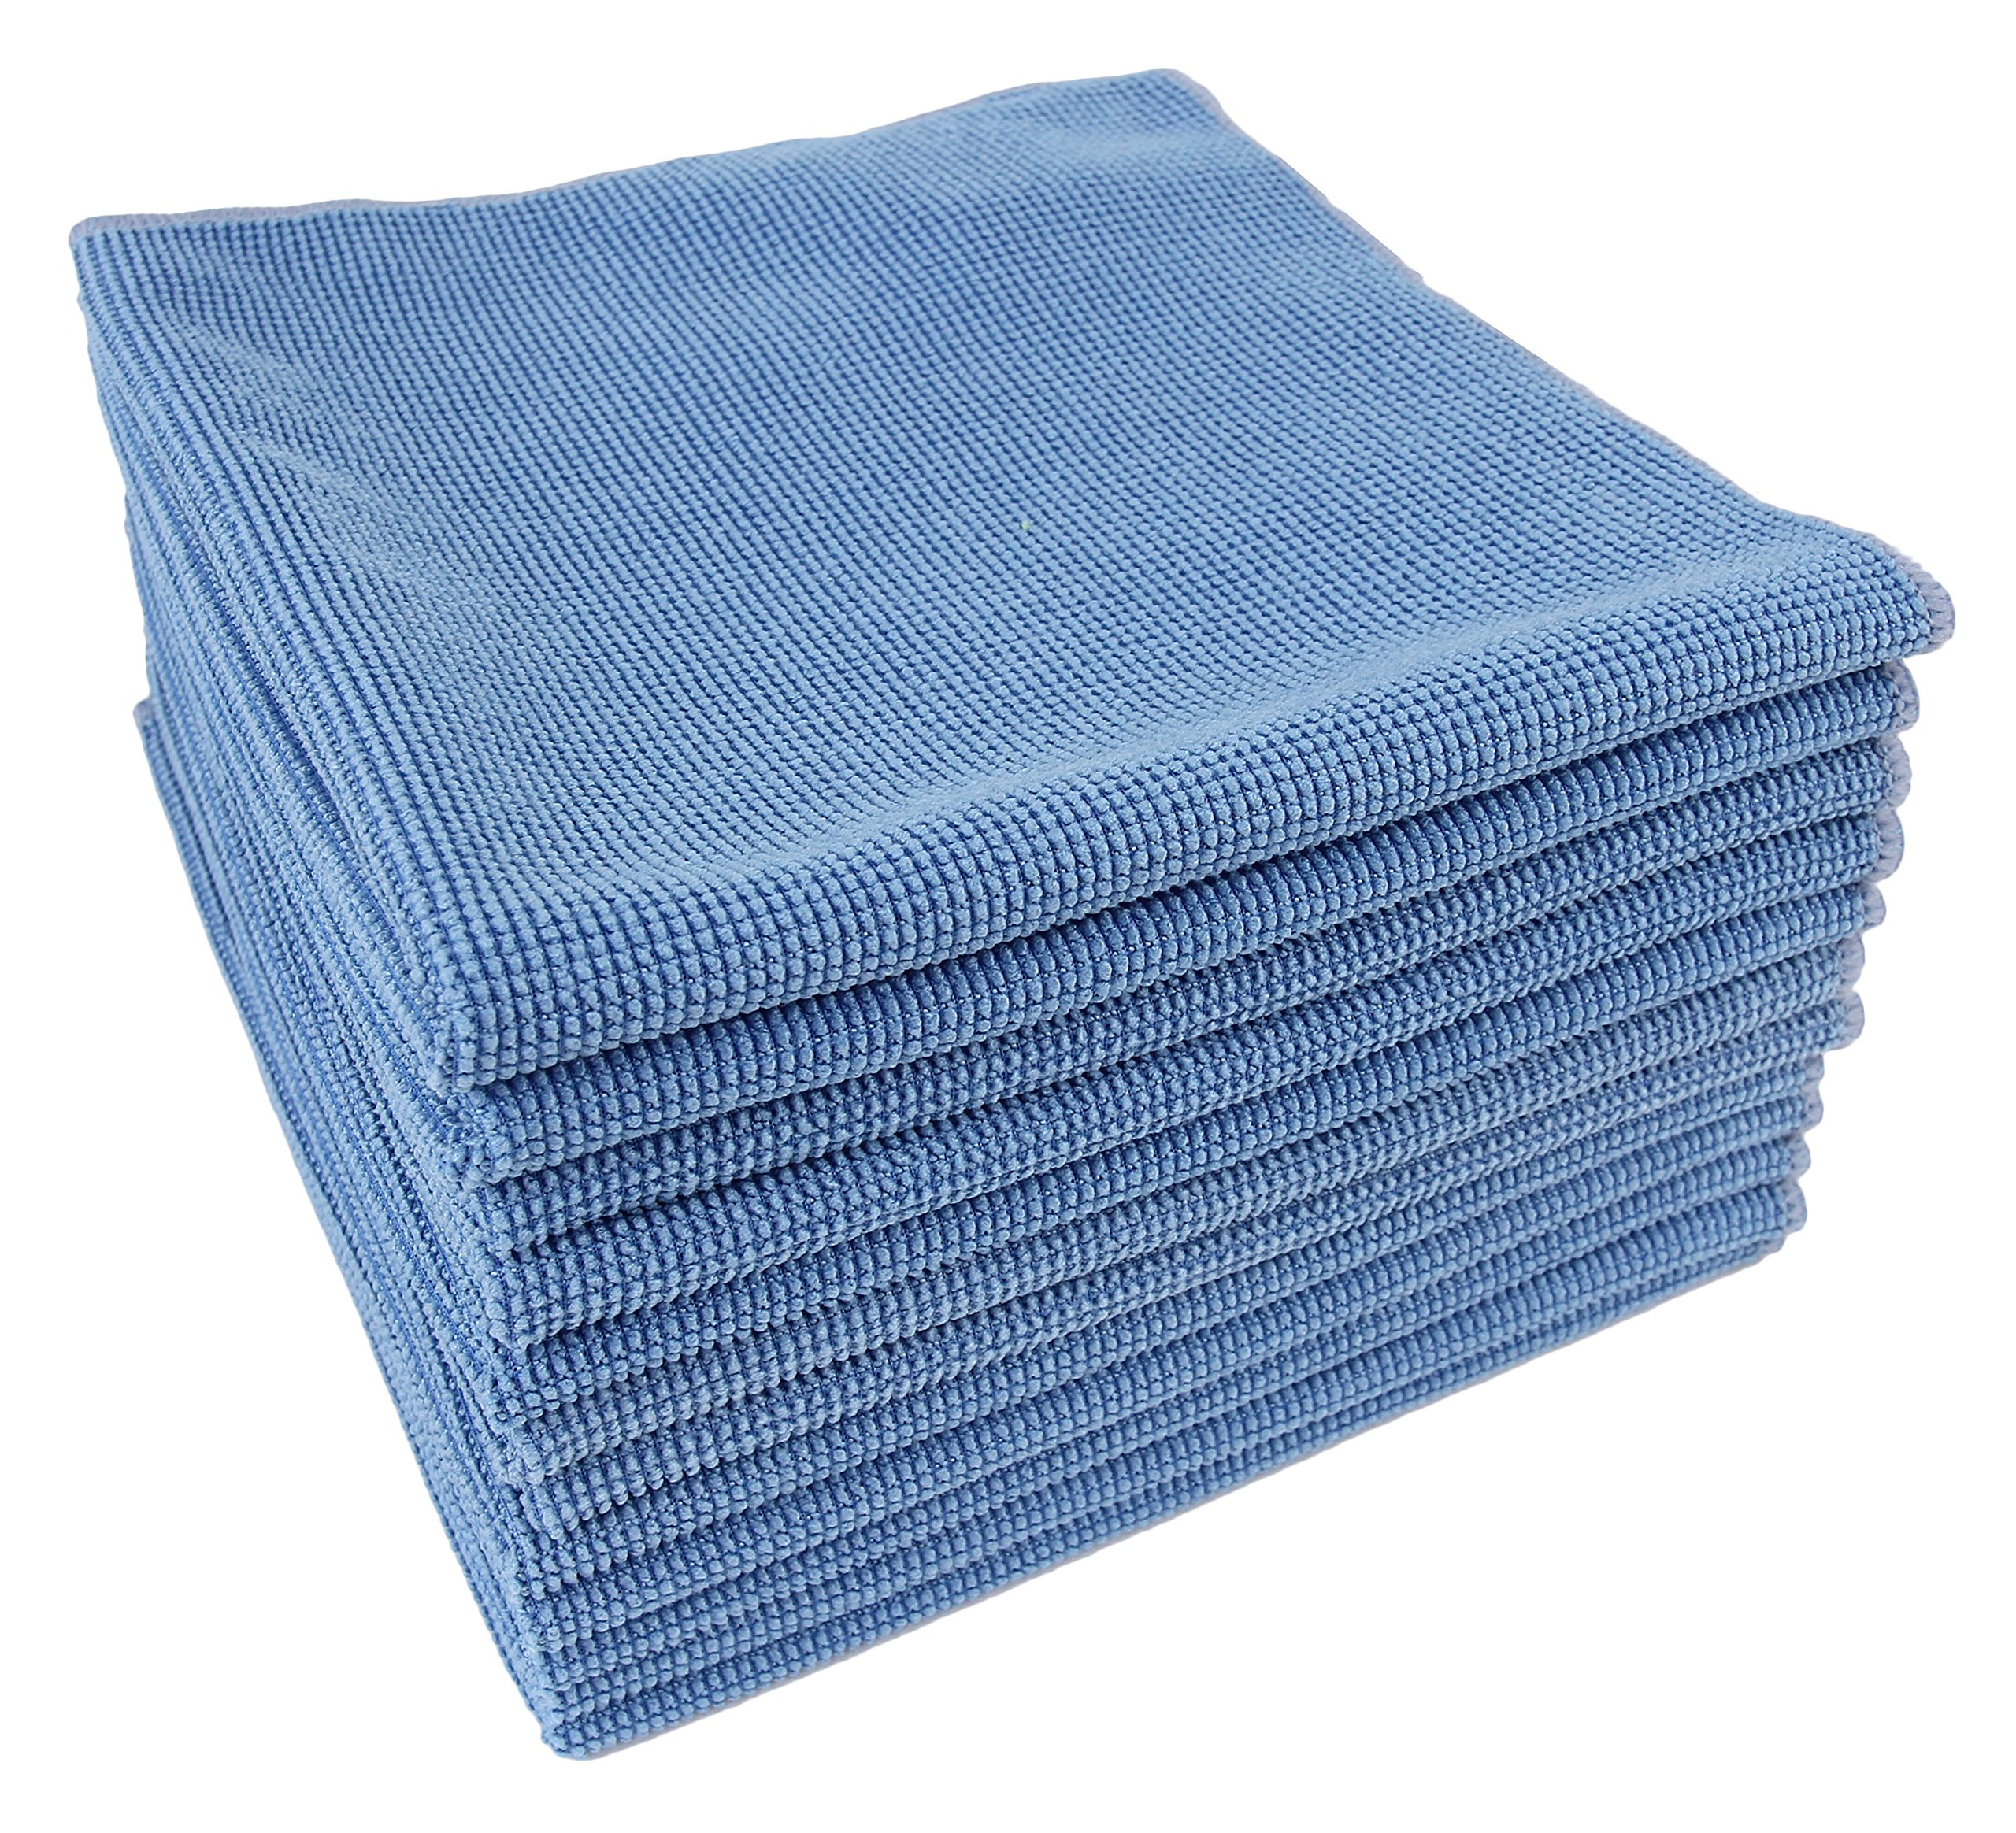 DRI Glass Cleaning Cloths, Set of 12(Blue)